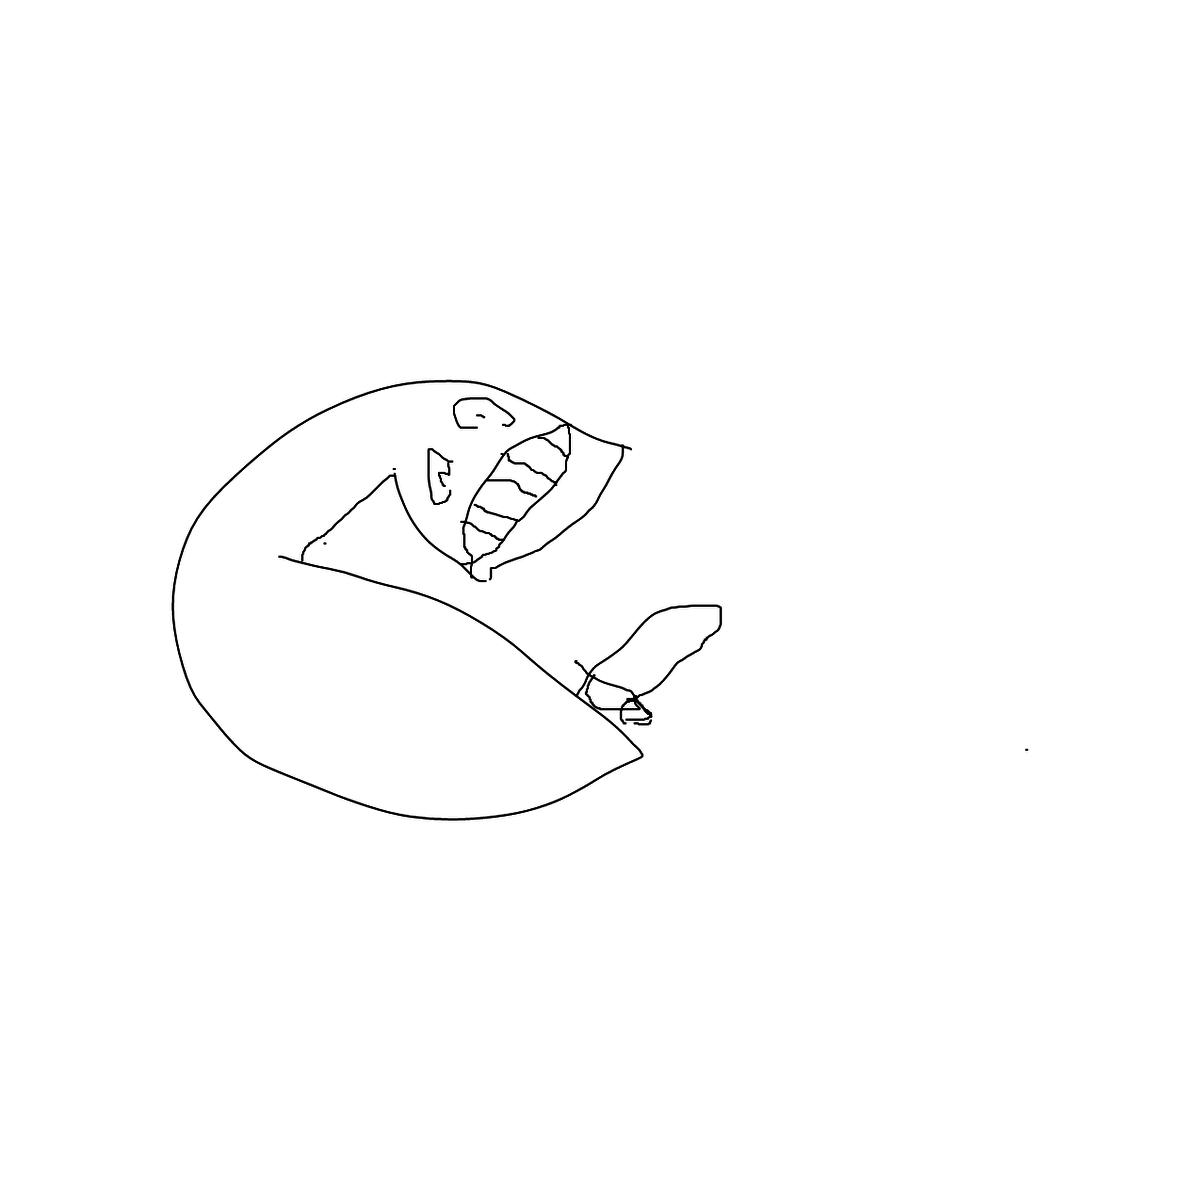 BAAAM drawing#16994 lat:40.8577919006347660lng: -74.8345947265625000